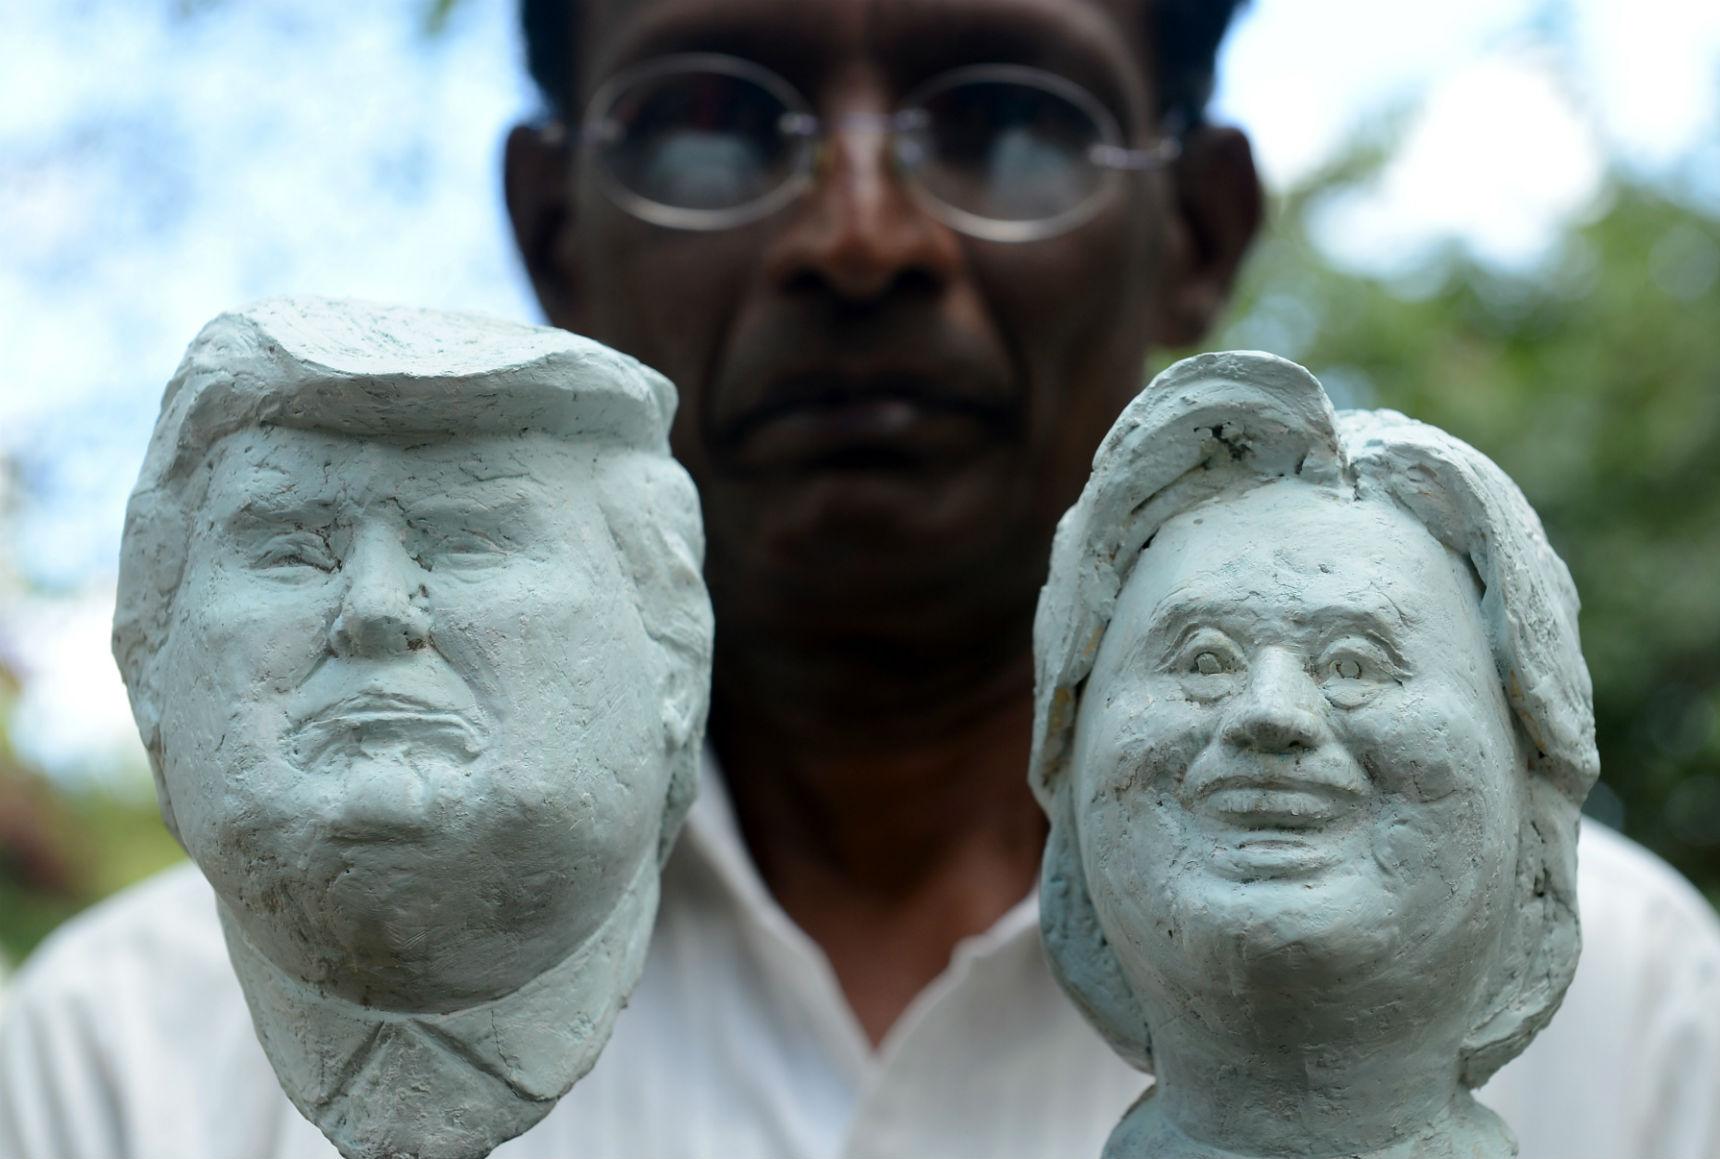 Busto de Trump e Hillary, do artista do Sri Lanka, Upali Dias. Foto de Lakruwan Wanniarach/ AFP